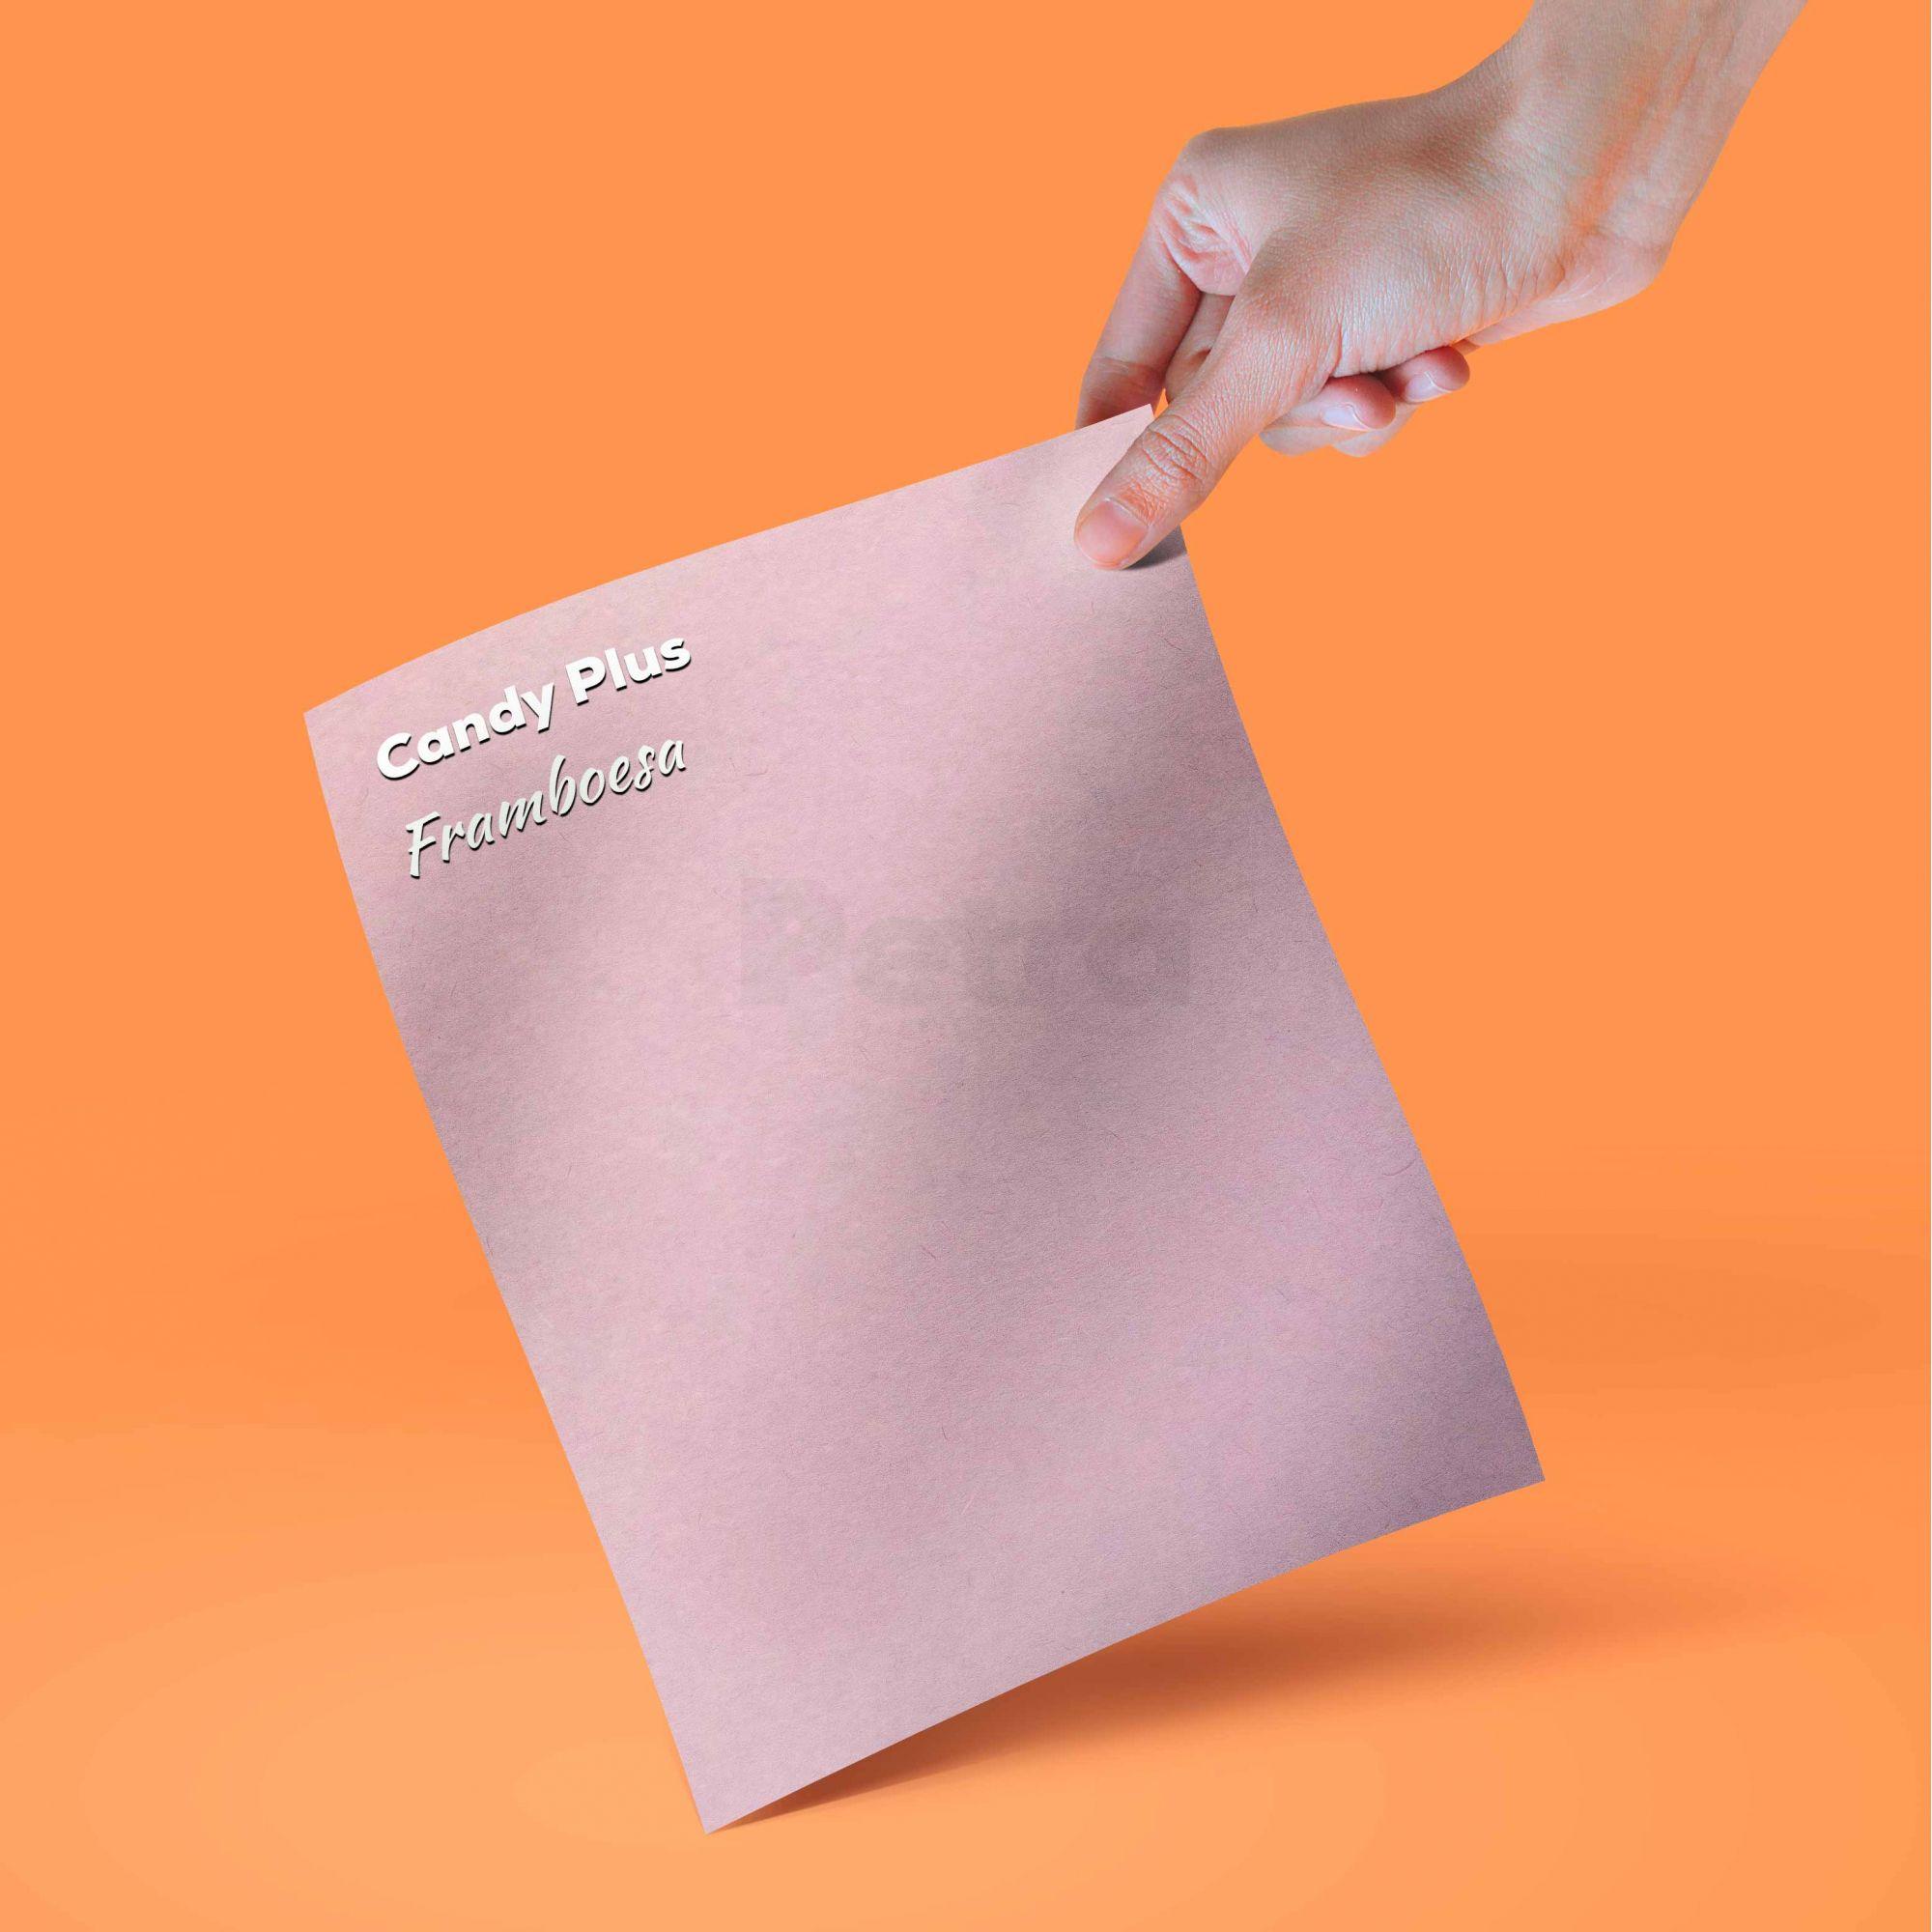 Candy Plus - Framboesa - Lilas - Tam. A4 - 180g/m² - 20 folhas